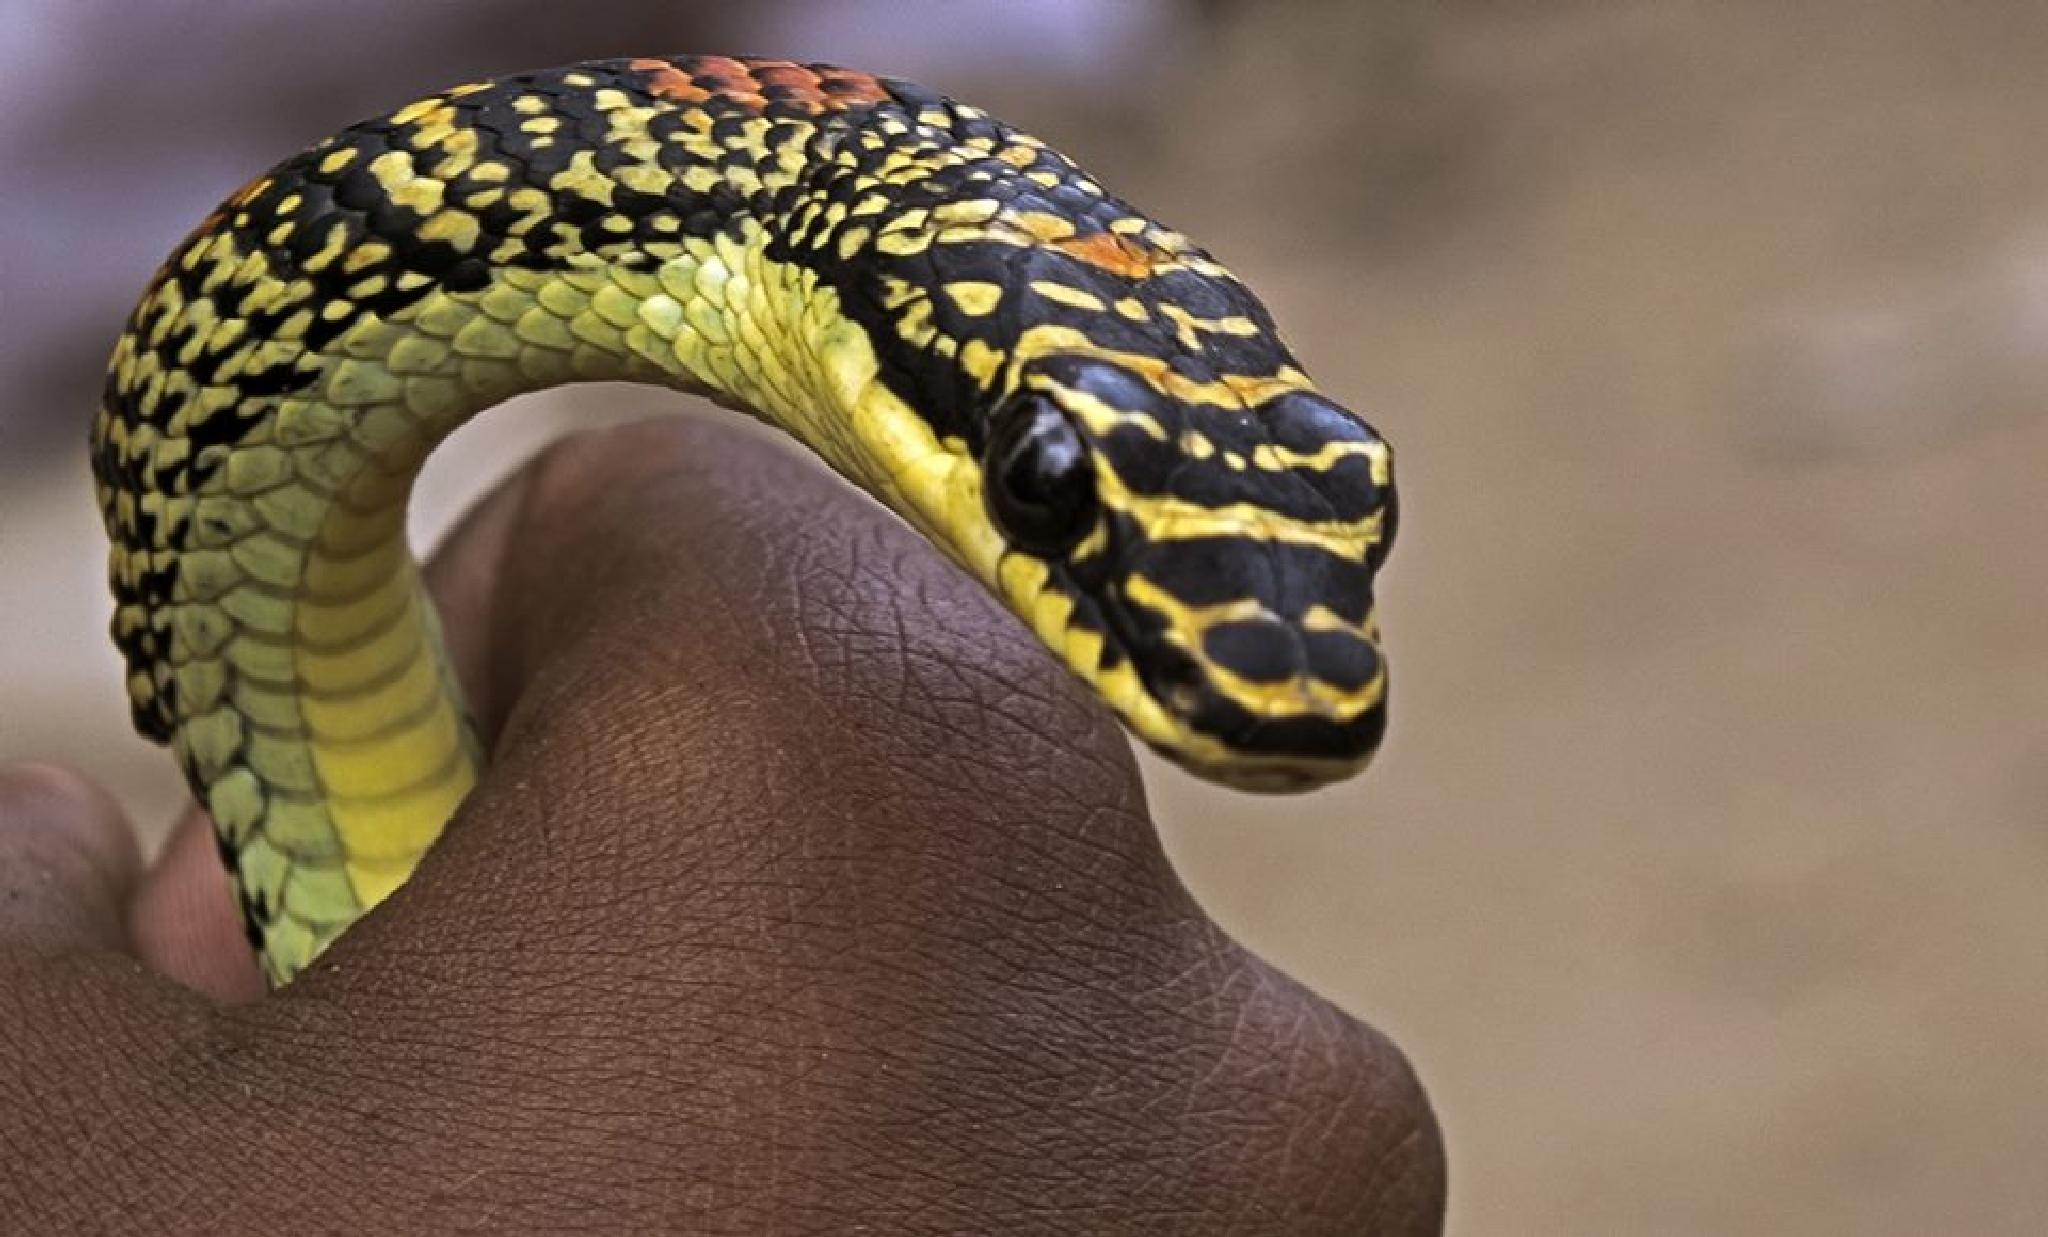 snake in the hand by albertsiraj